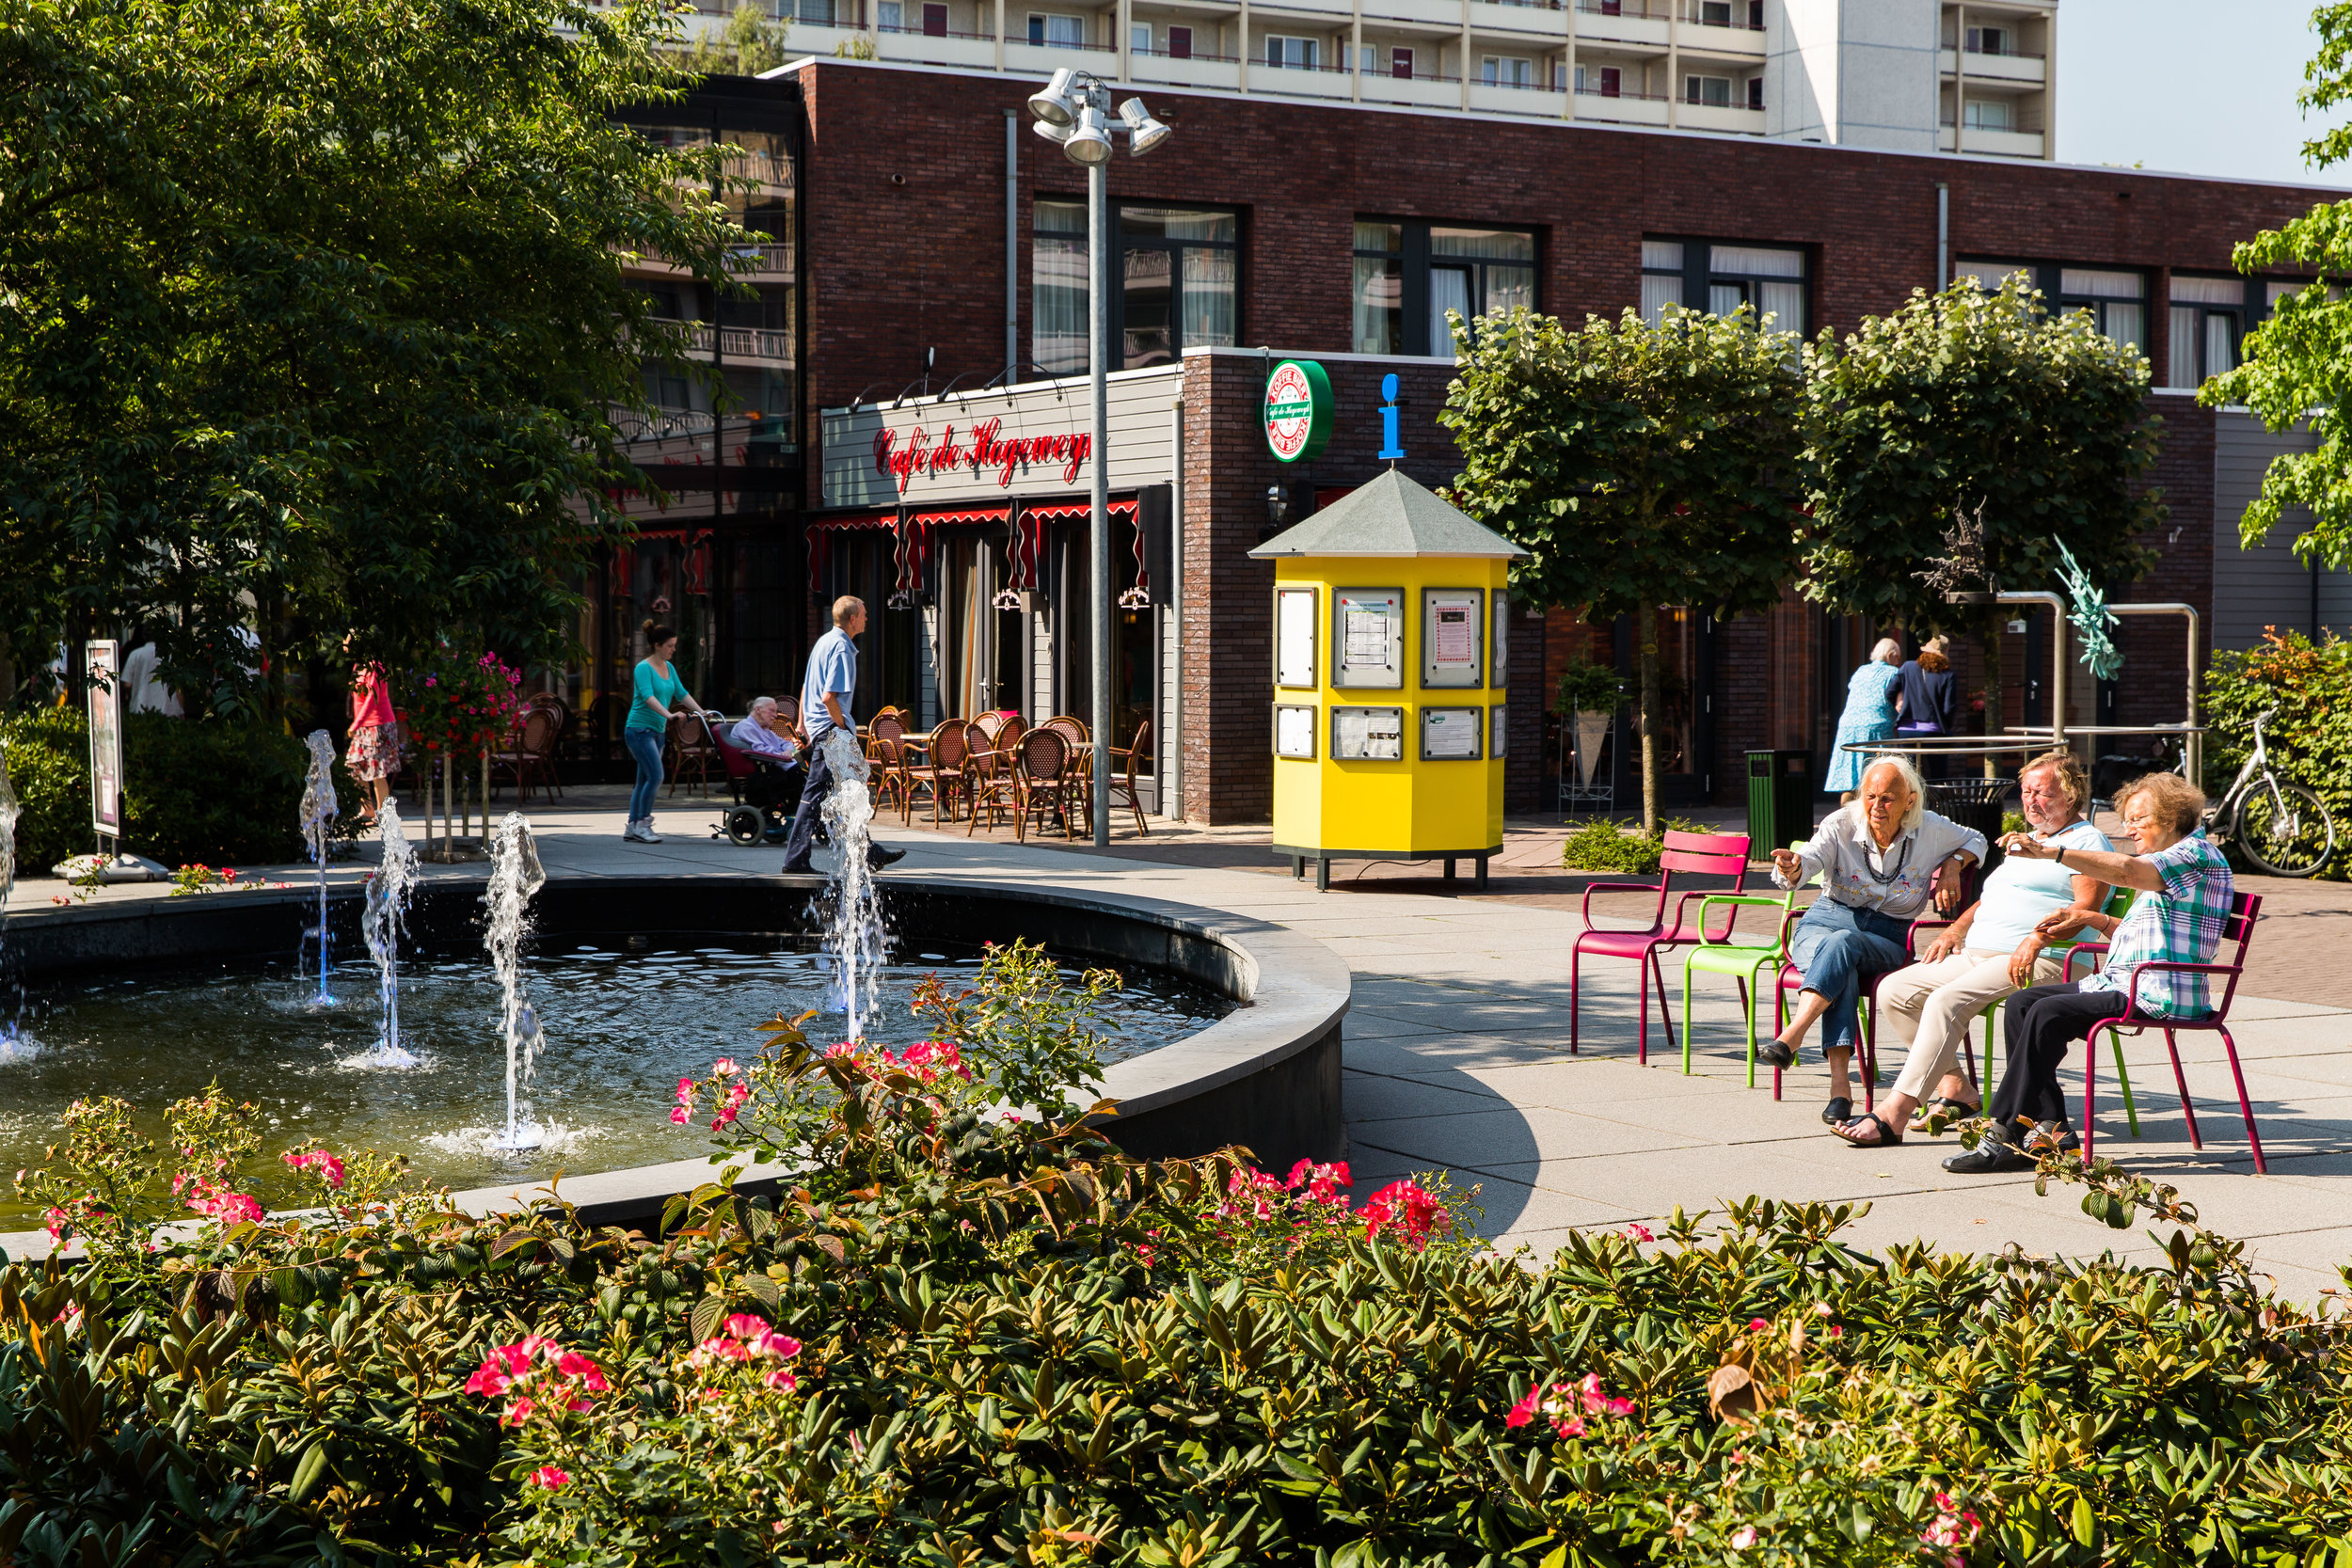 Residents of de Hogeweyk sitting by an outdoor fountain.